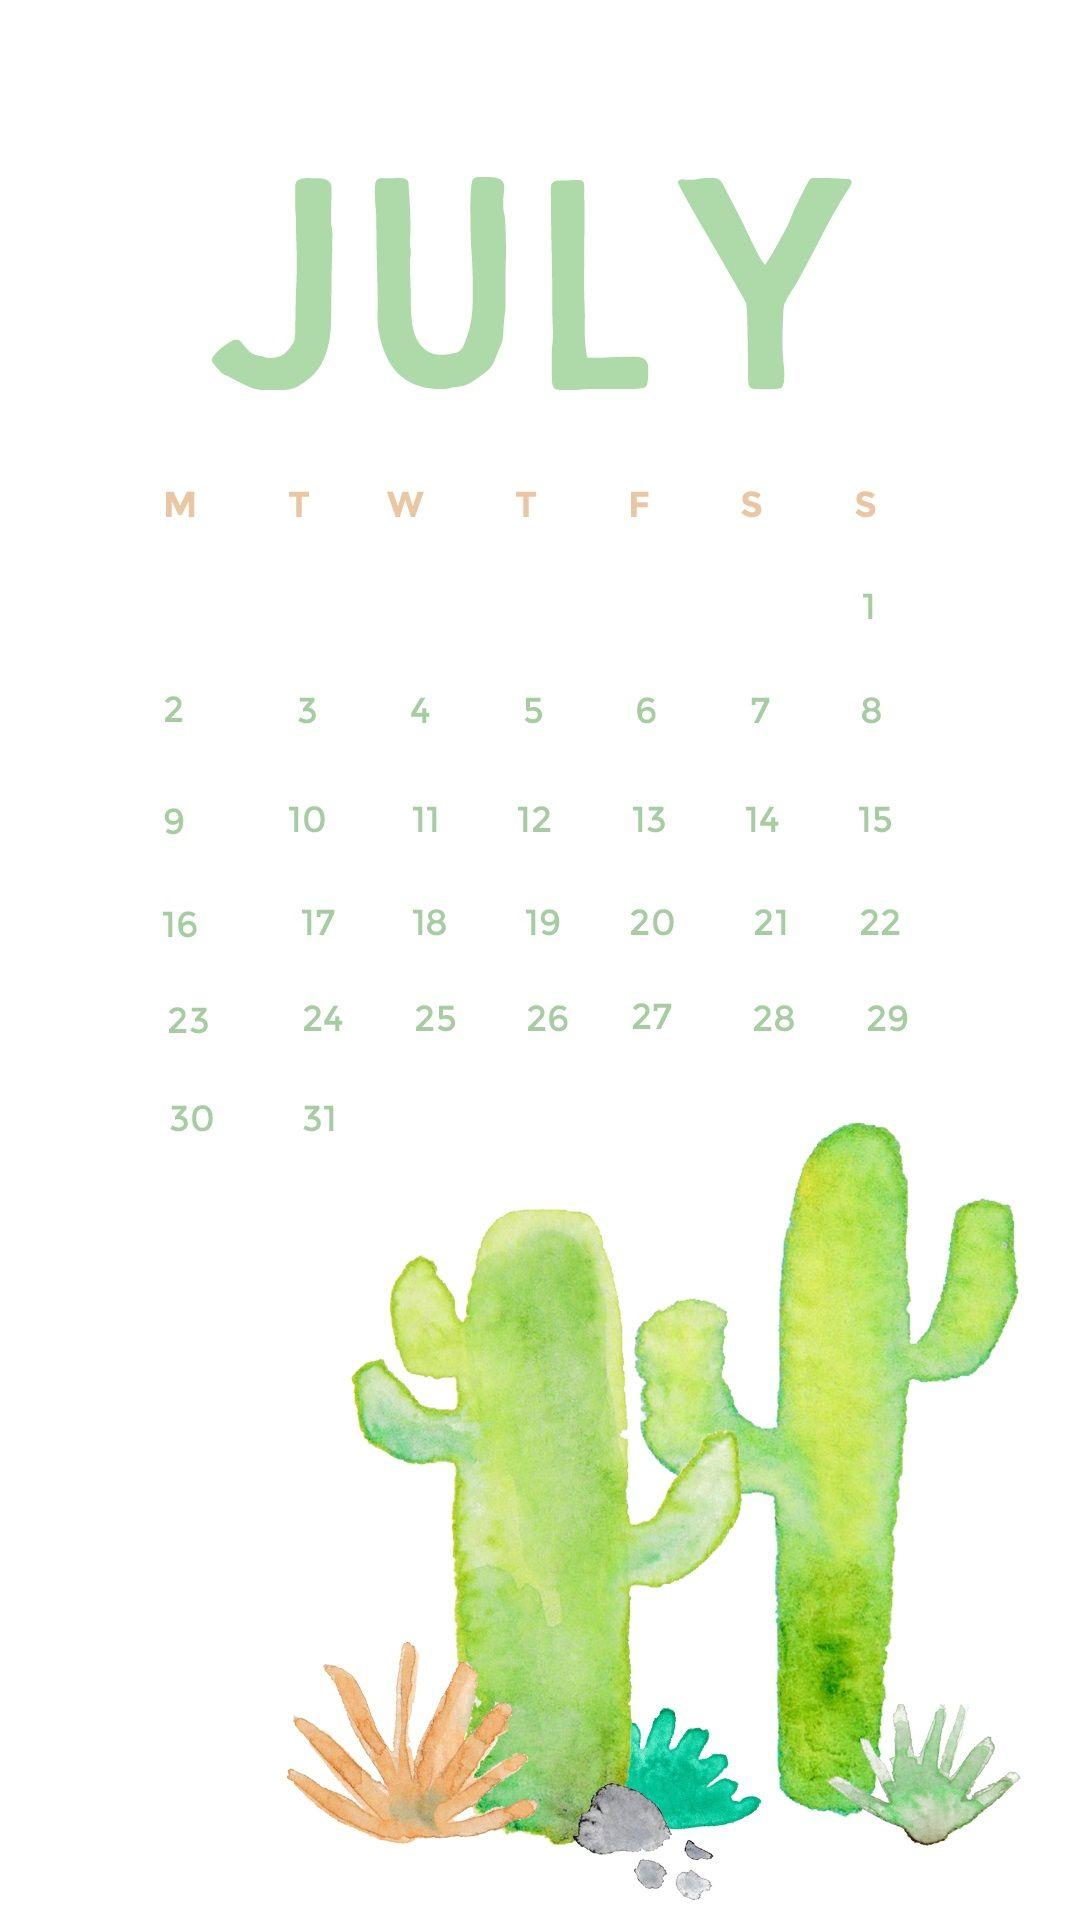 Watercolor July 2018 iPhone Calendar Calendar 2018 Calendar 1080x1920